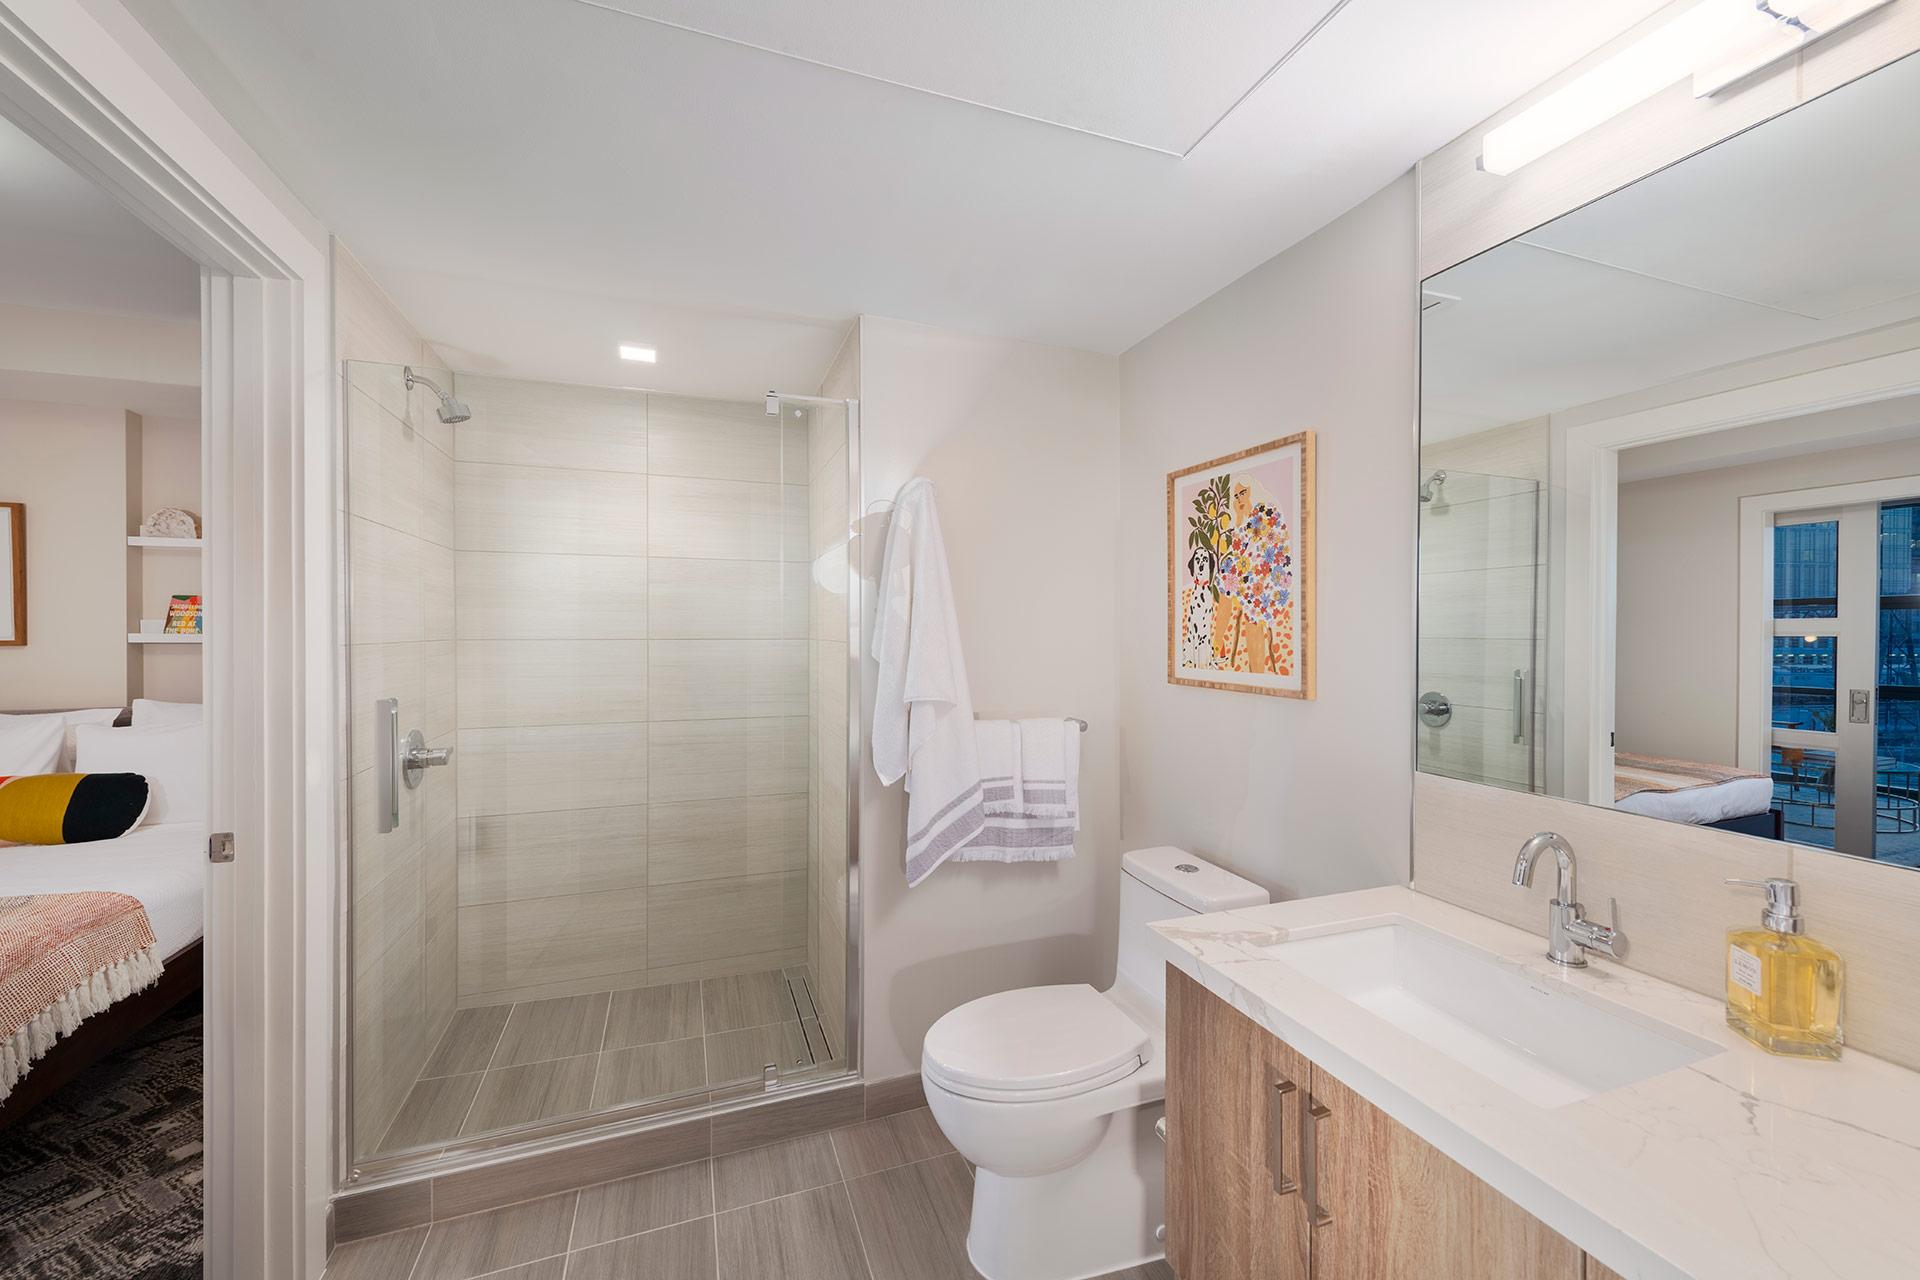 bathroom vanity mirror toilet shower